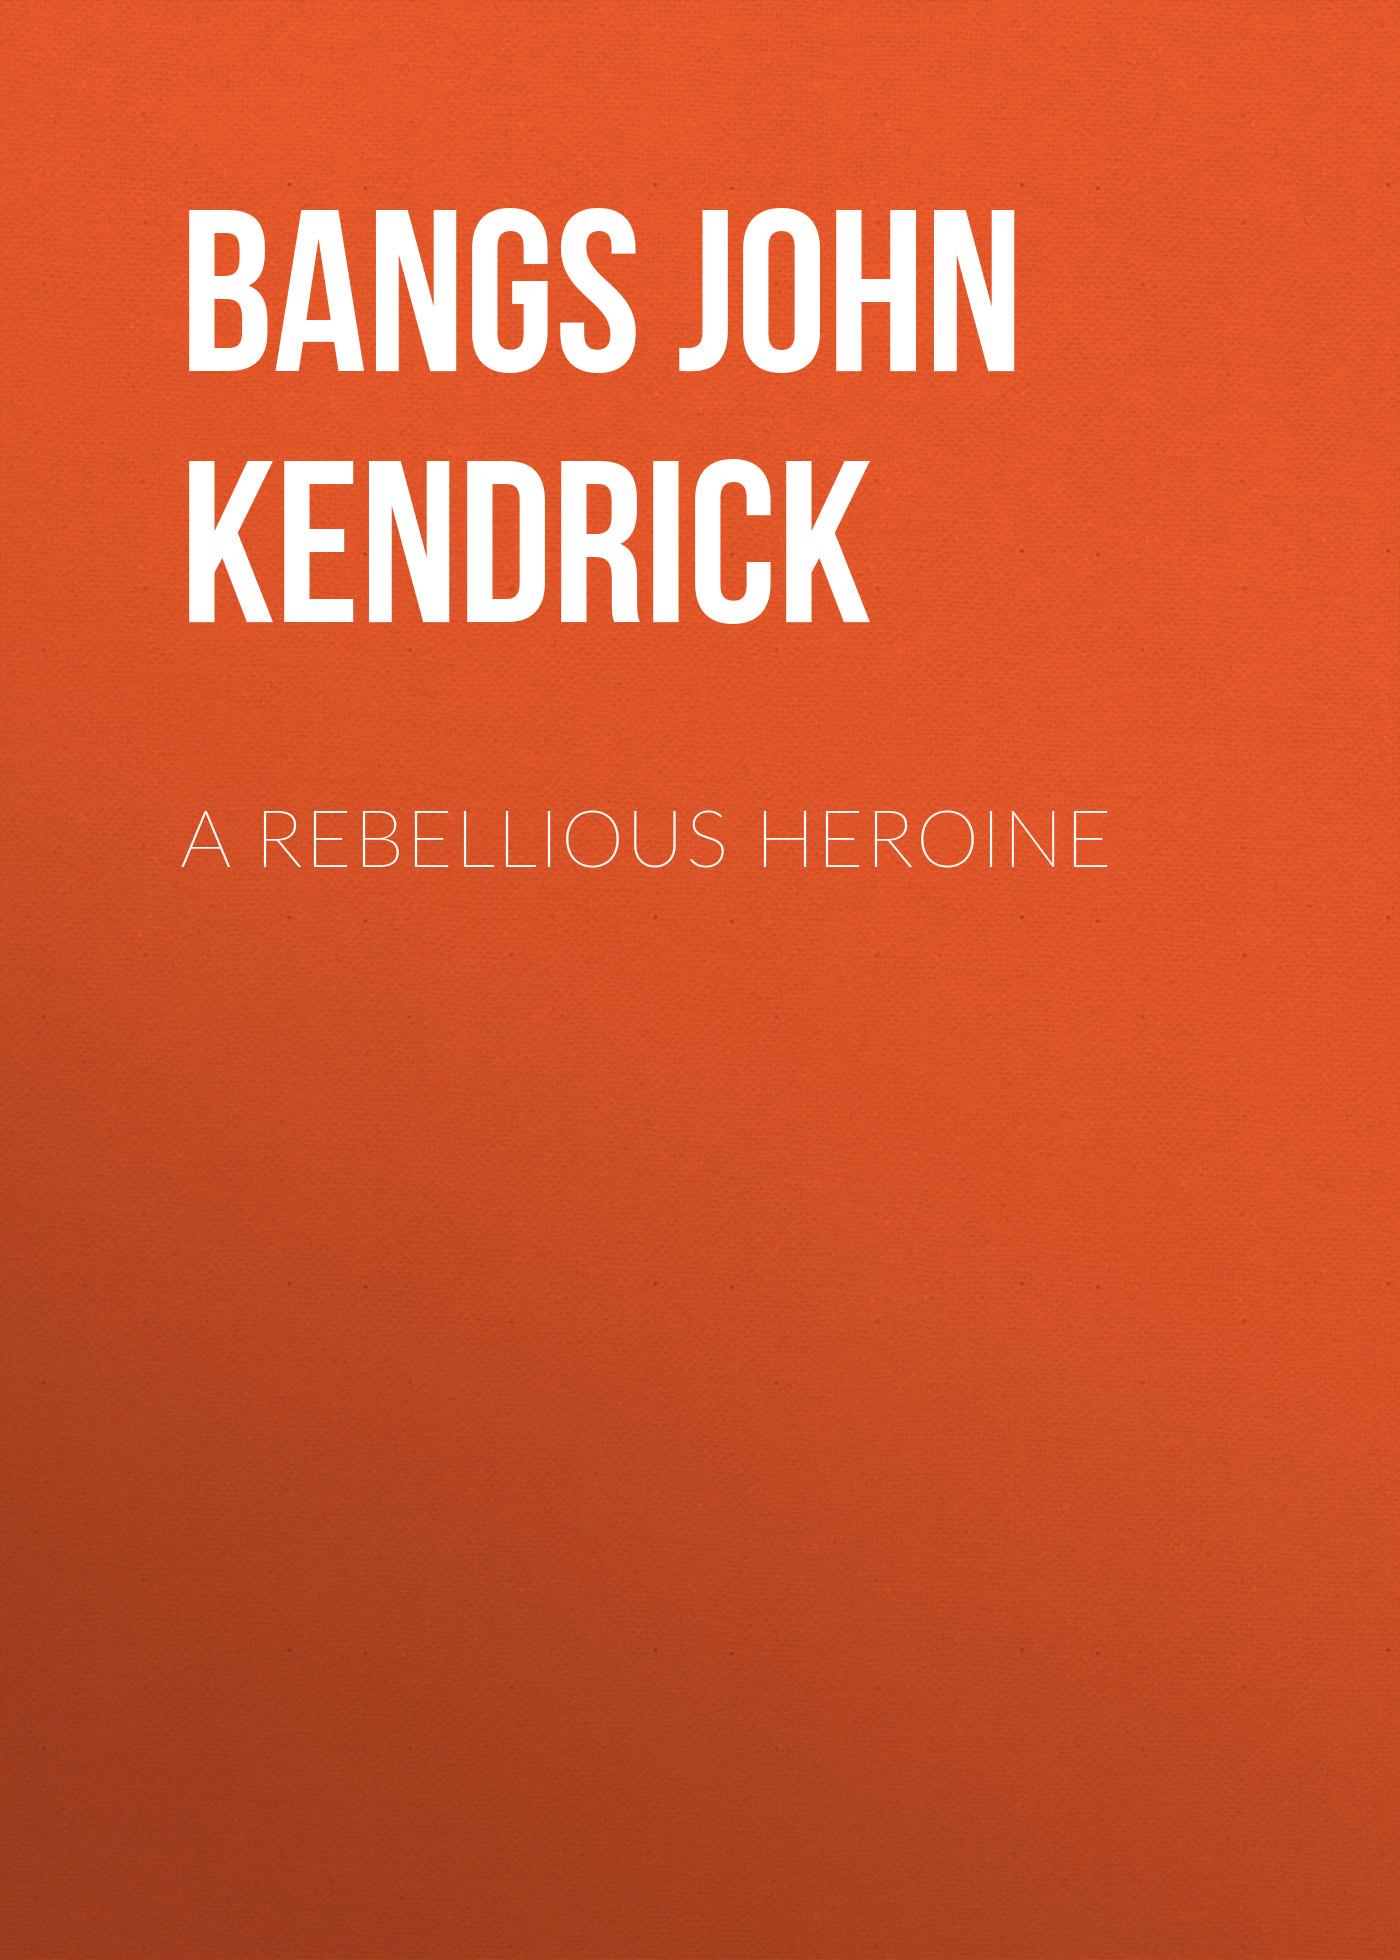 Bangs John Kendrick A Rebellious Heroine